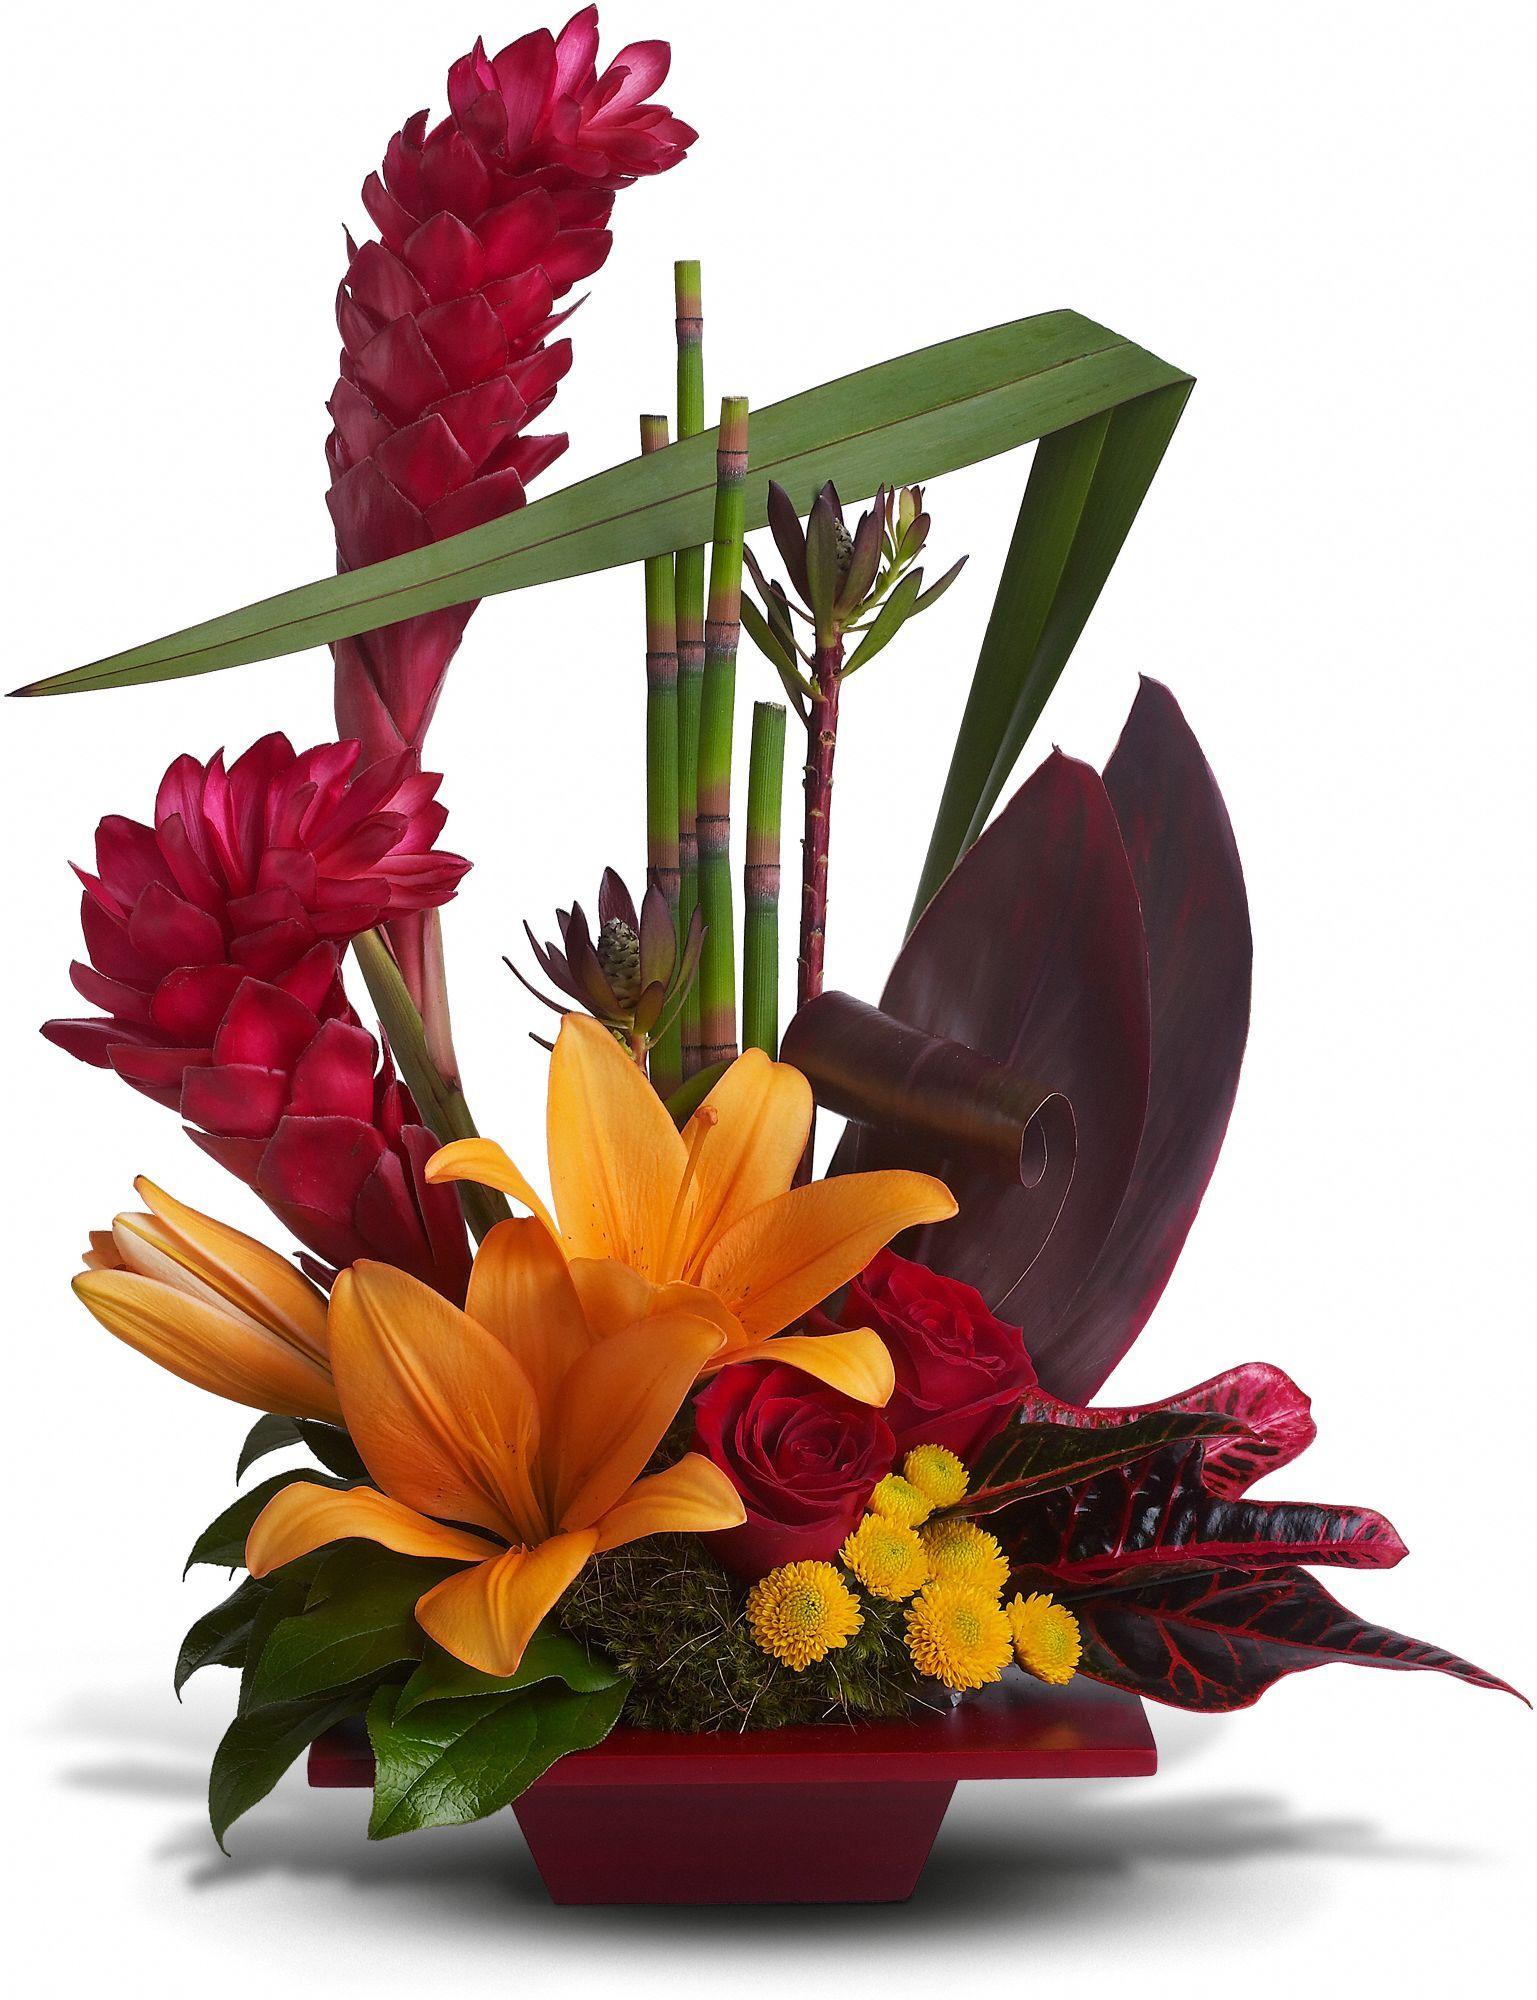 Teleflora's Tropical Bliss Flowers, Teleflora's Tropical